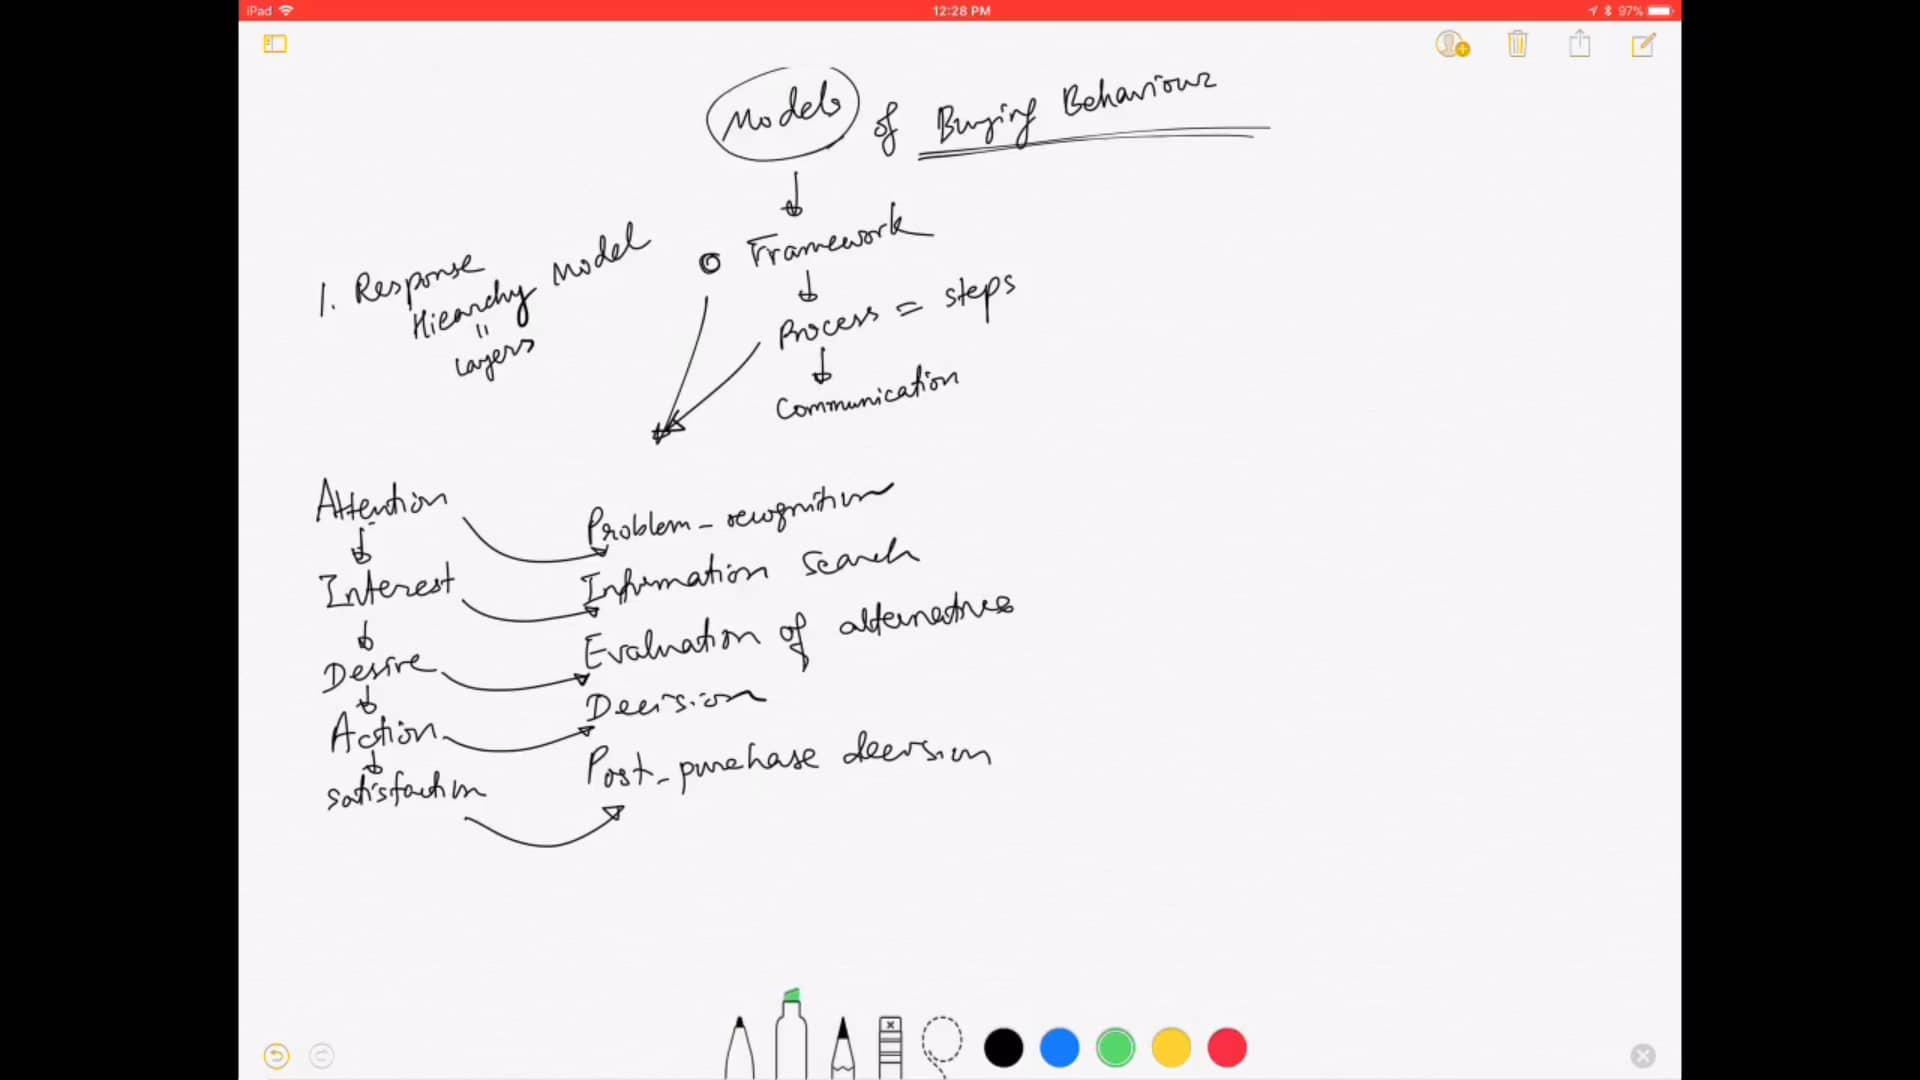 Ch 5- Models of Buying Behavior